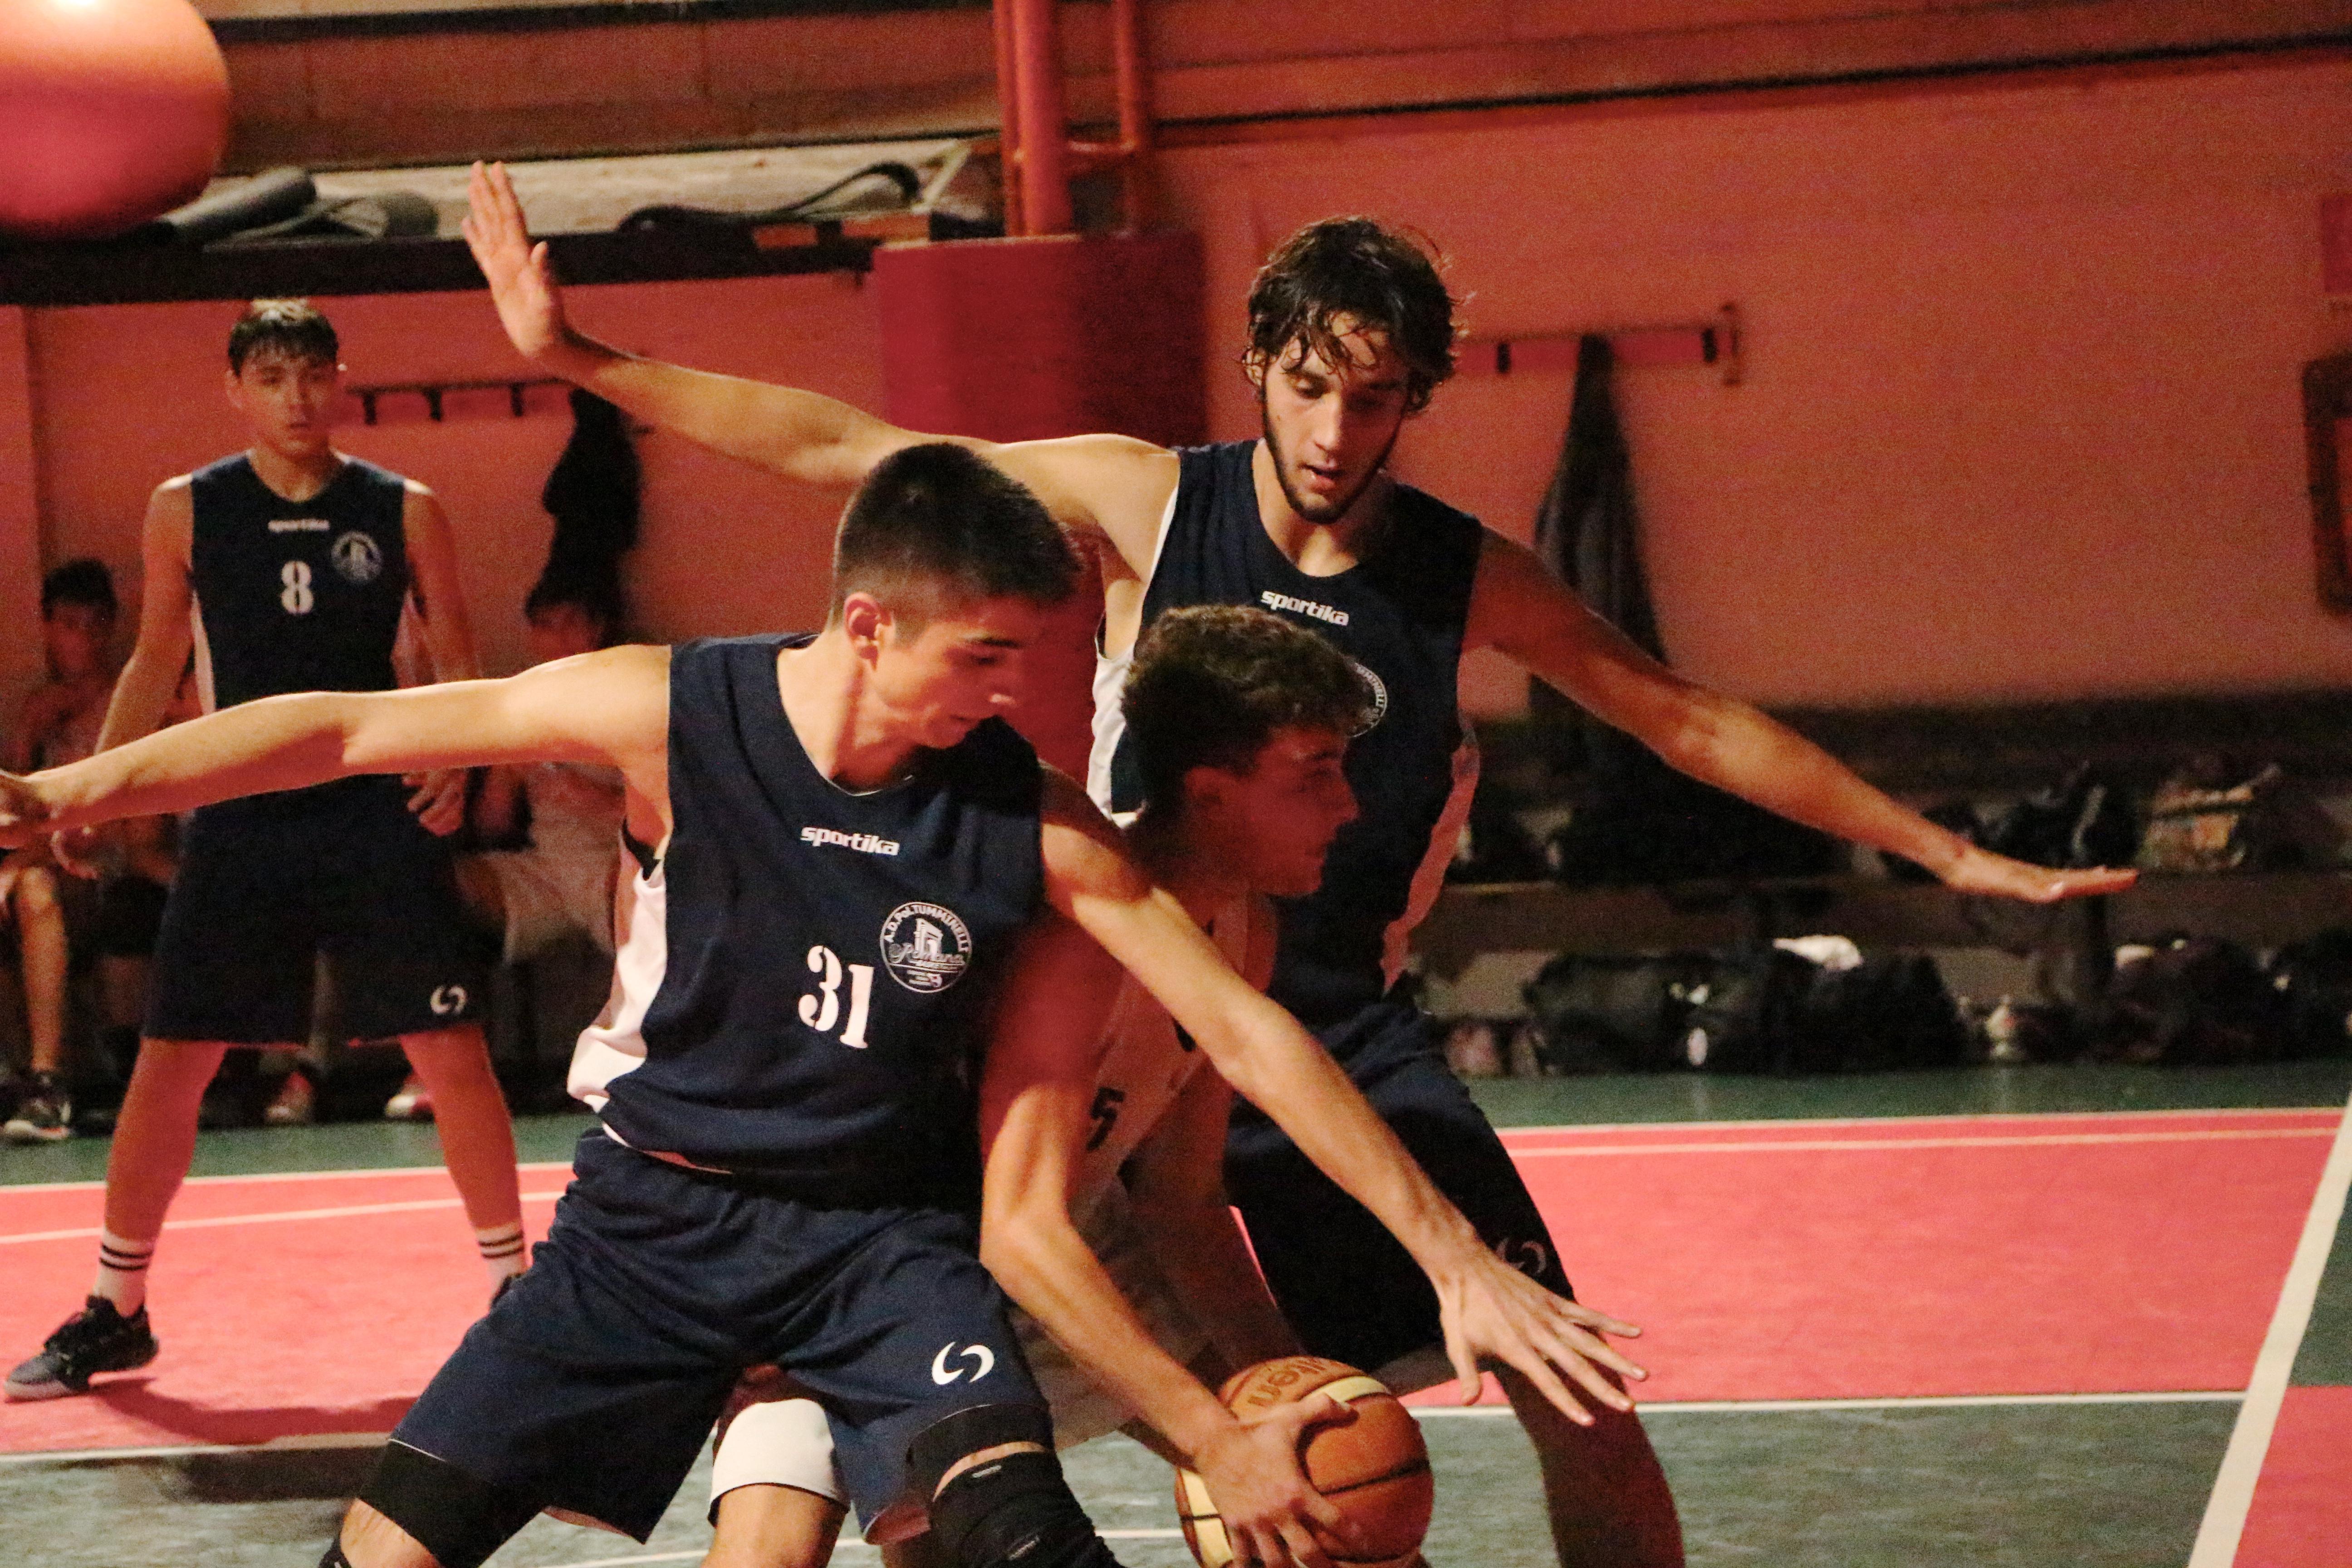 U18Blu at Canottieri